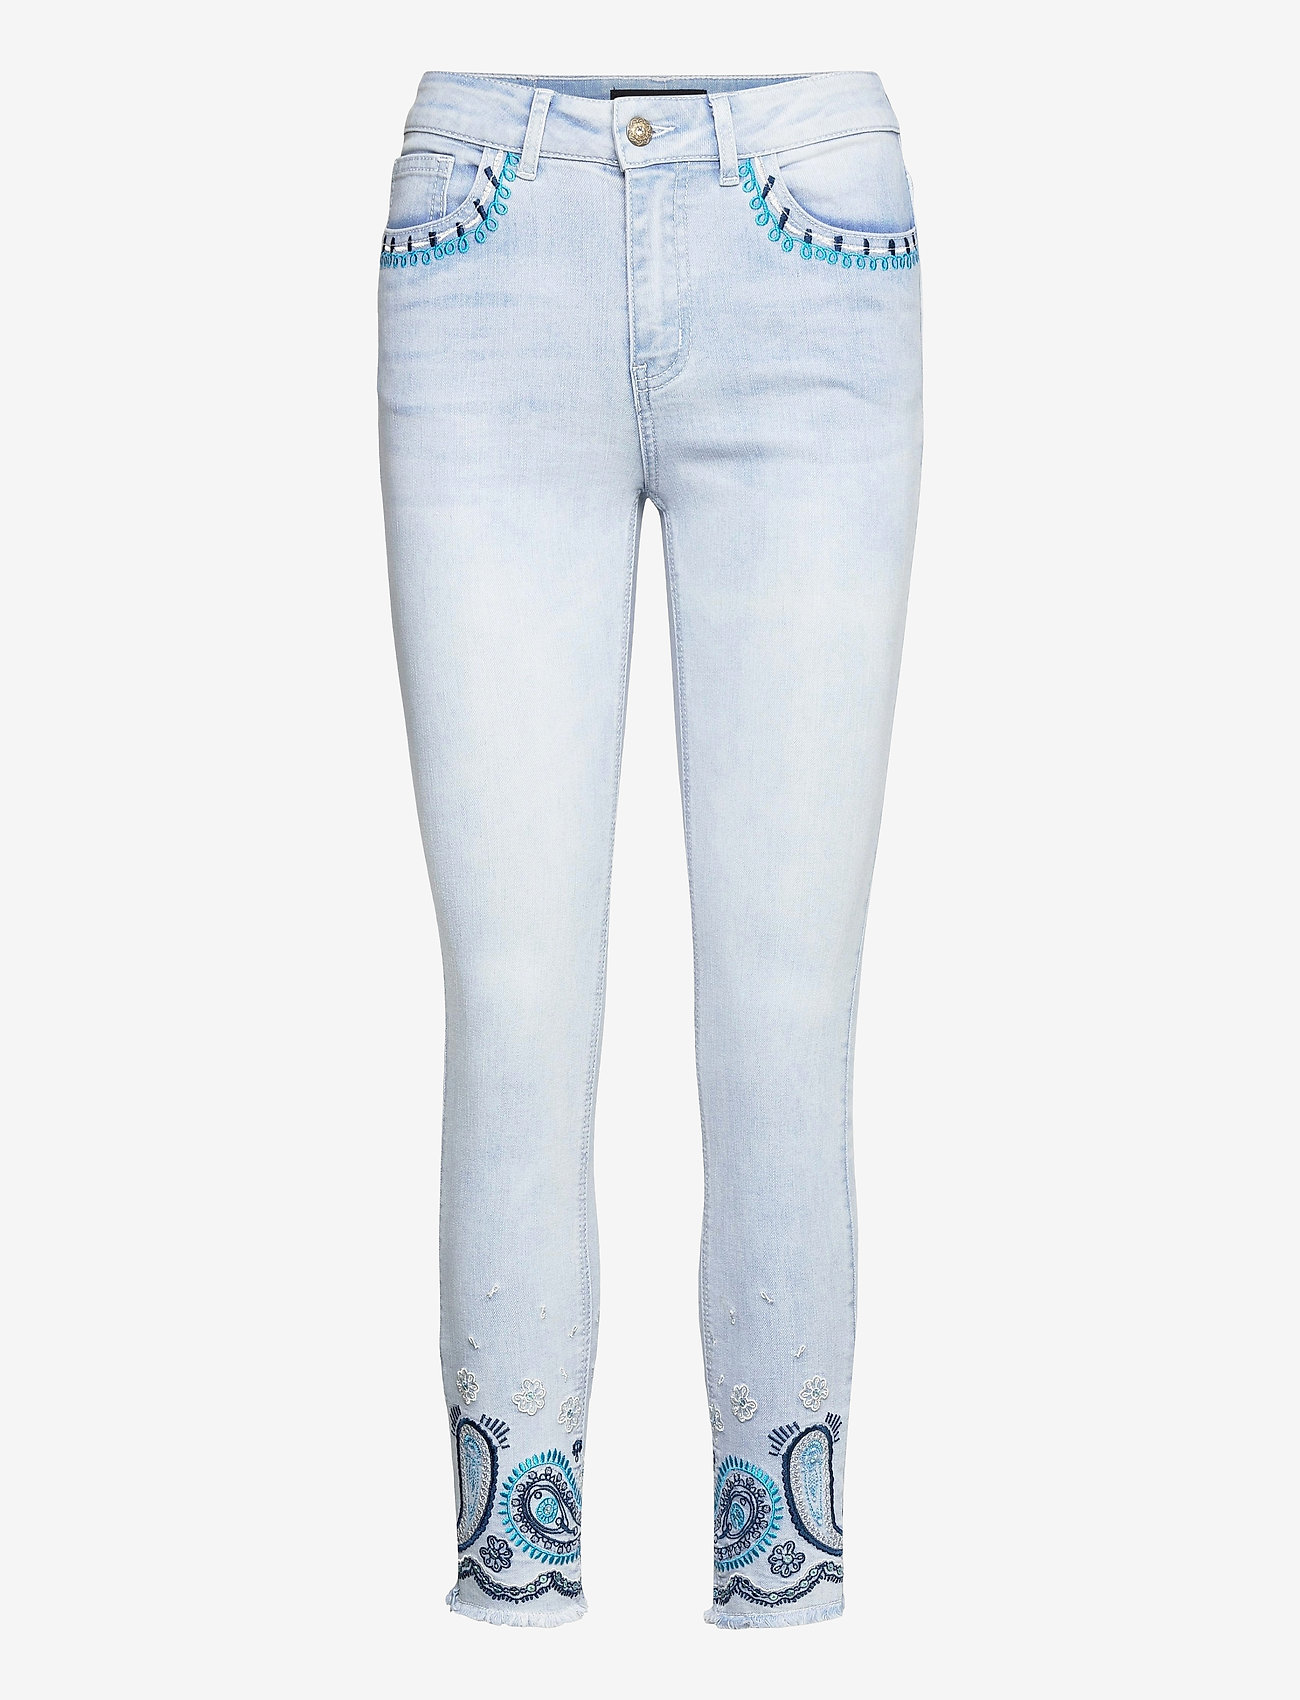 Desigual - DENIM ANKLE PAISL - skinny jeans - denim bleach - 0